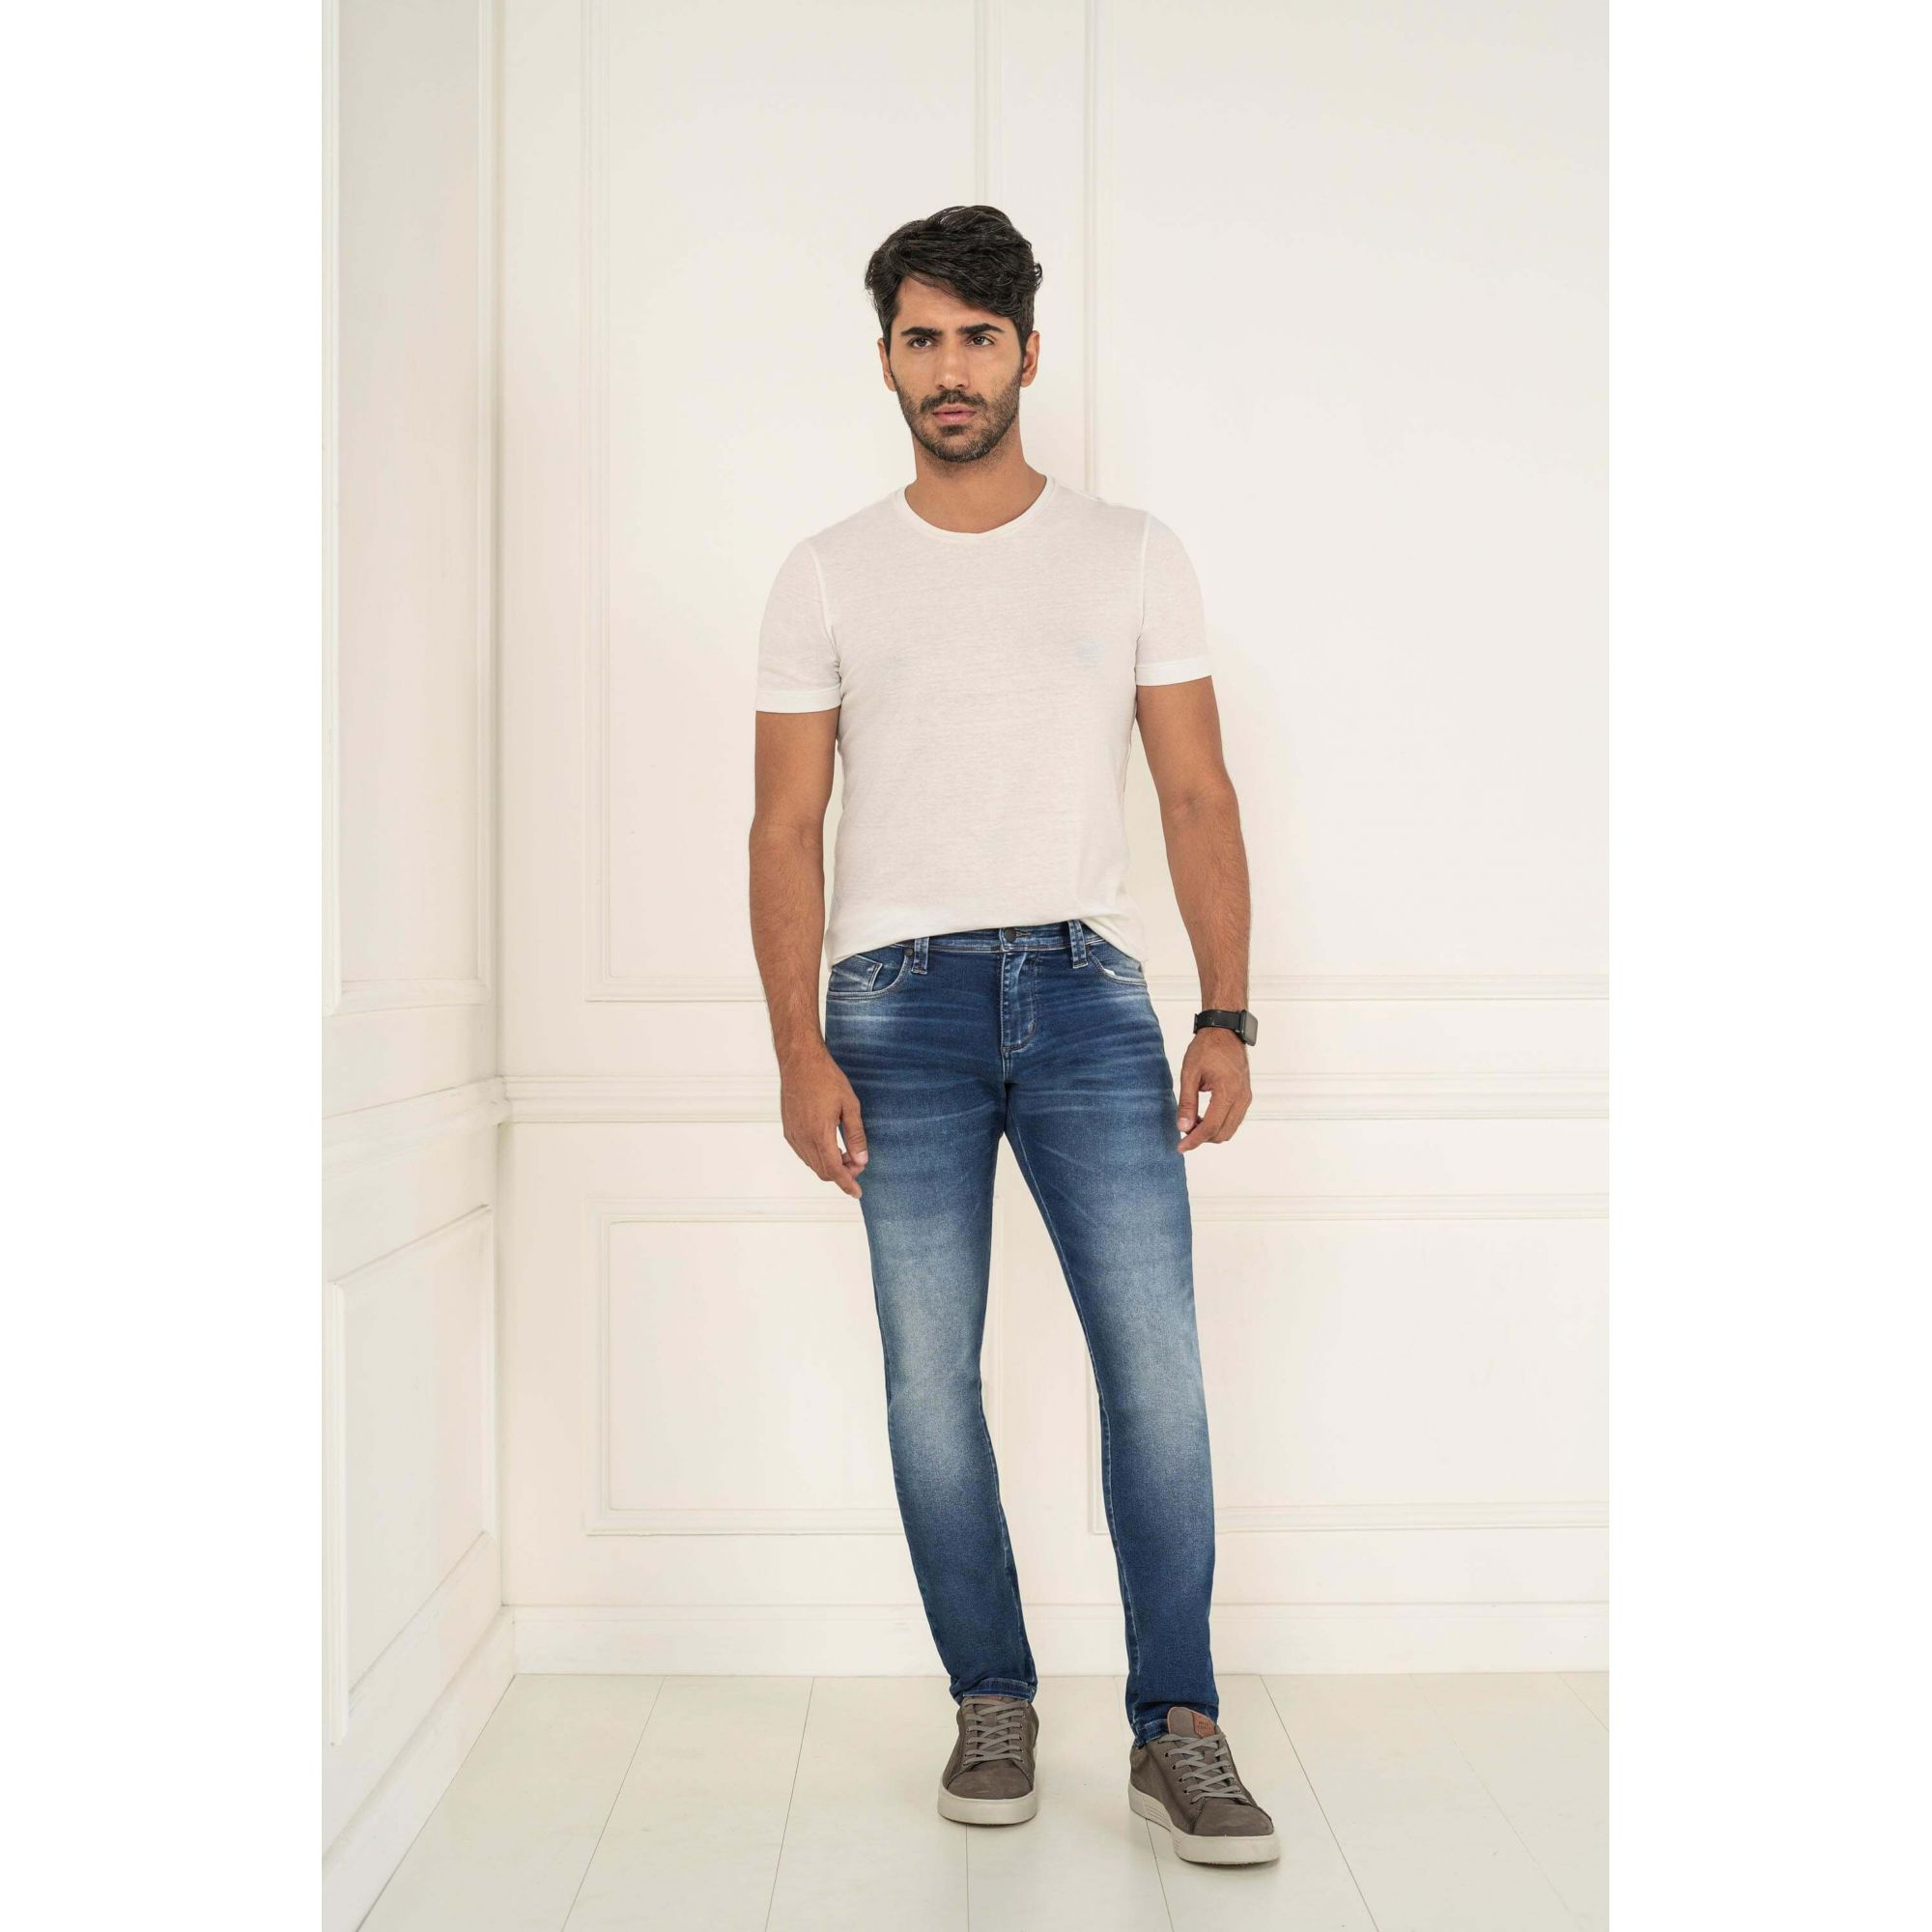 Calça Masculino Skinny Lycra Jeans - KACOLAKO